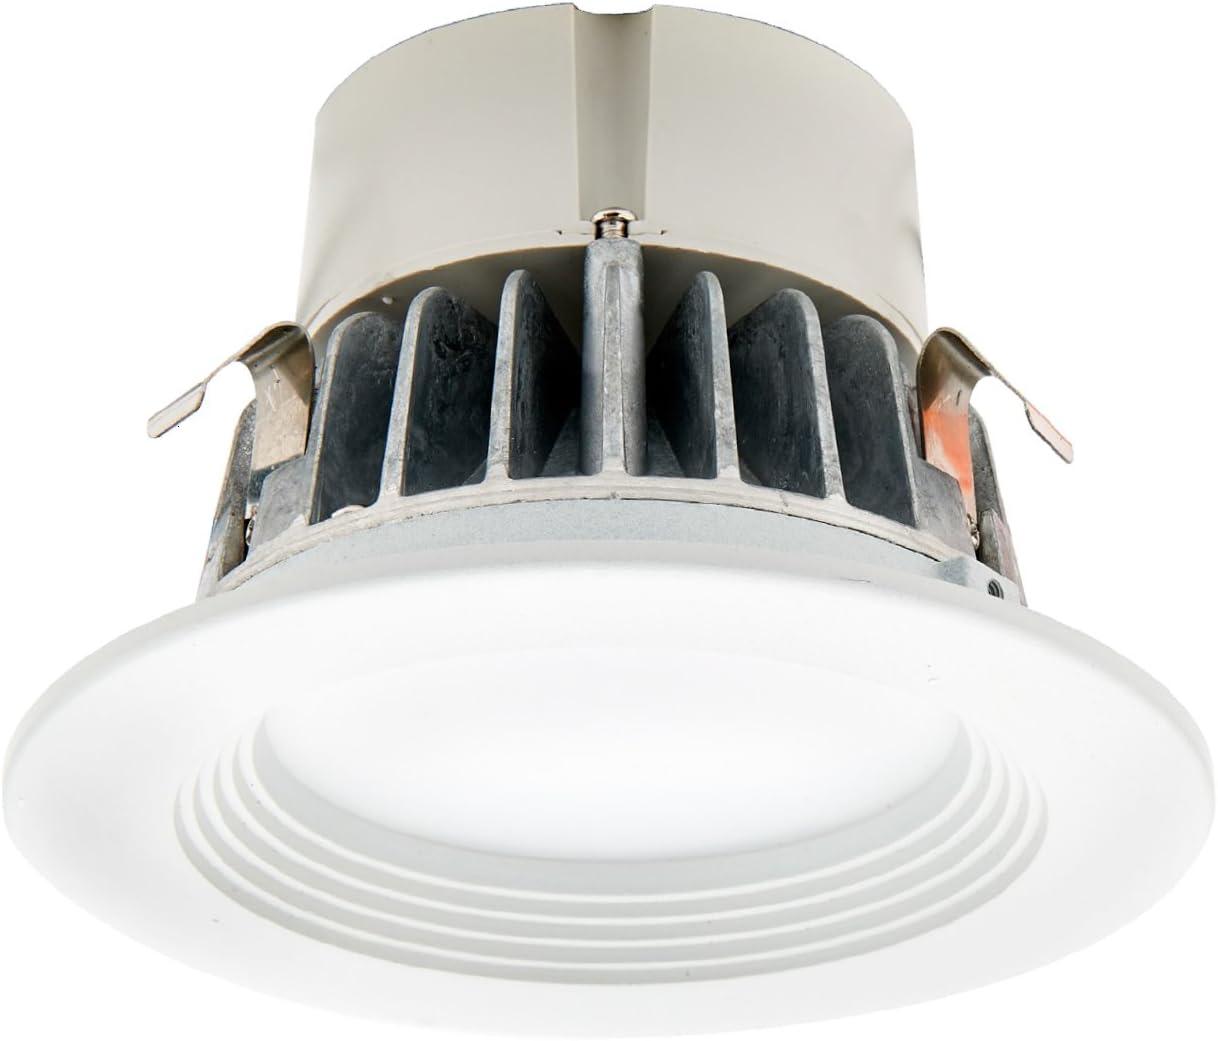 Electrix DWR4FF9 Essential LED Recessed Light Retrofit Kit, Fixe